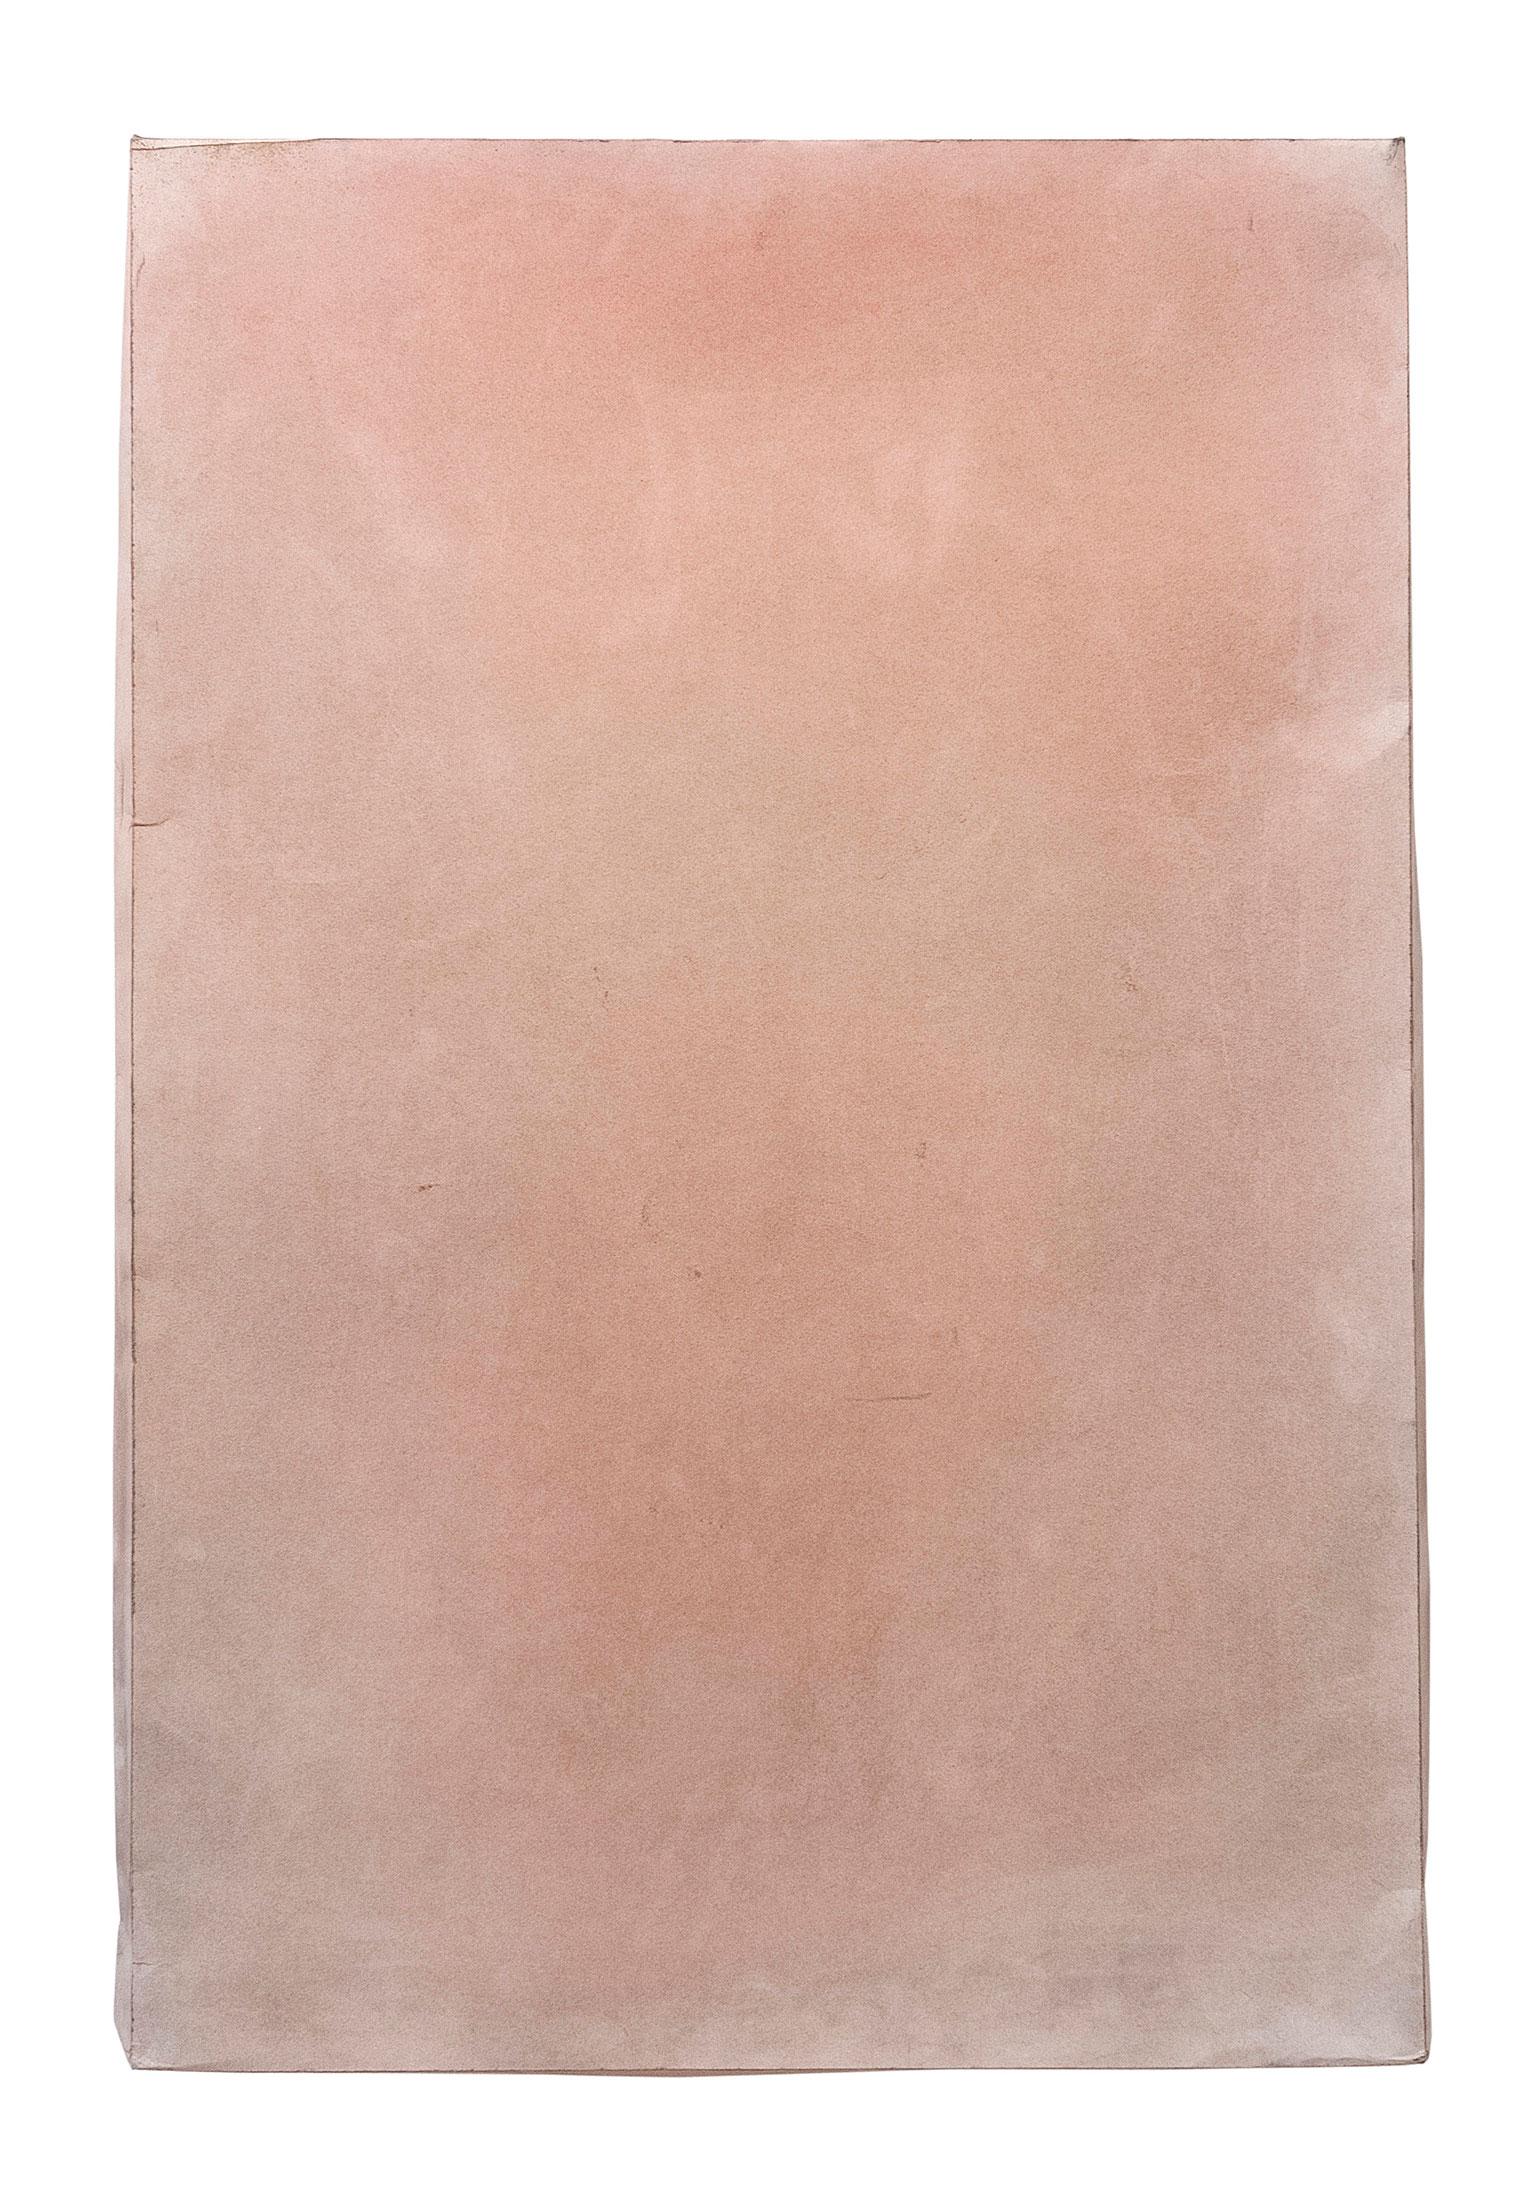 <b>Title:</b>Wrap<br /><b>Year:</b>2012<br /><b>Medium:</b>Charcoal and chalk on paper<br /><b>Size:</b>78 x 53 cm